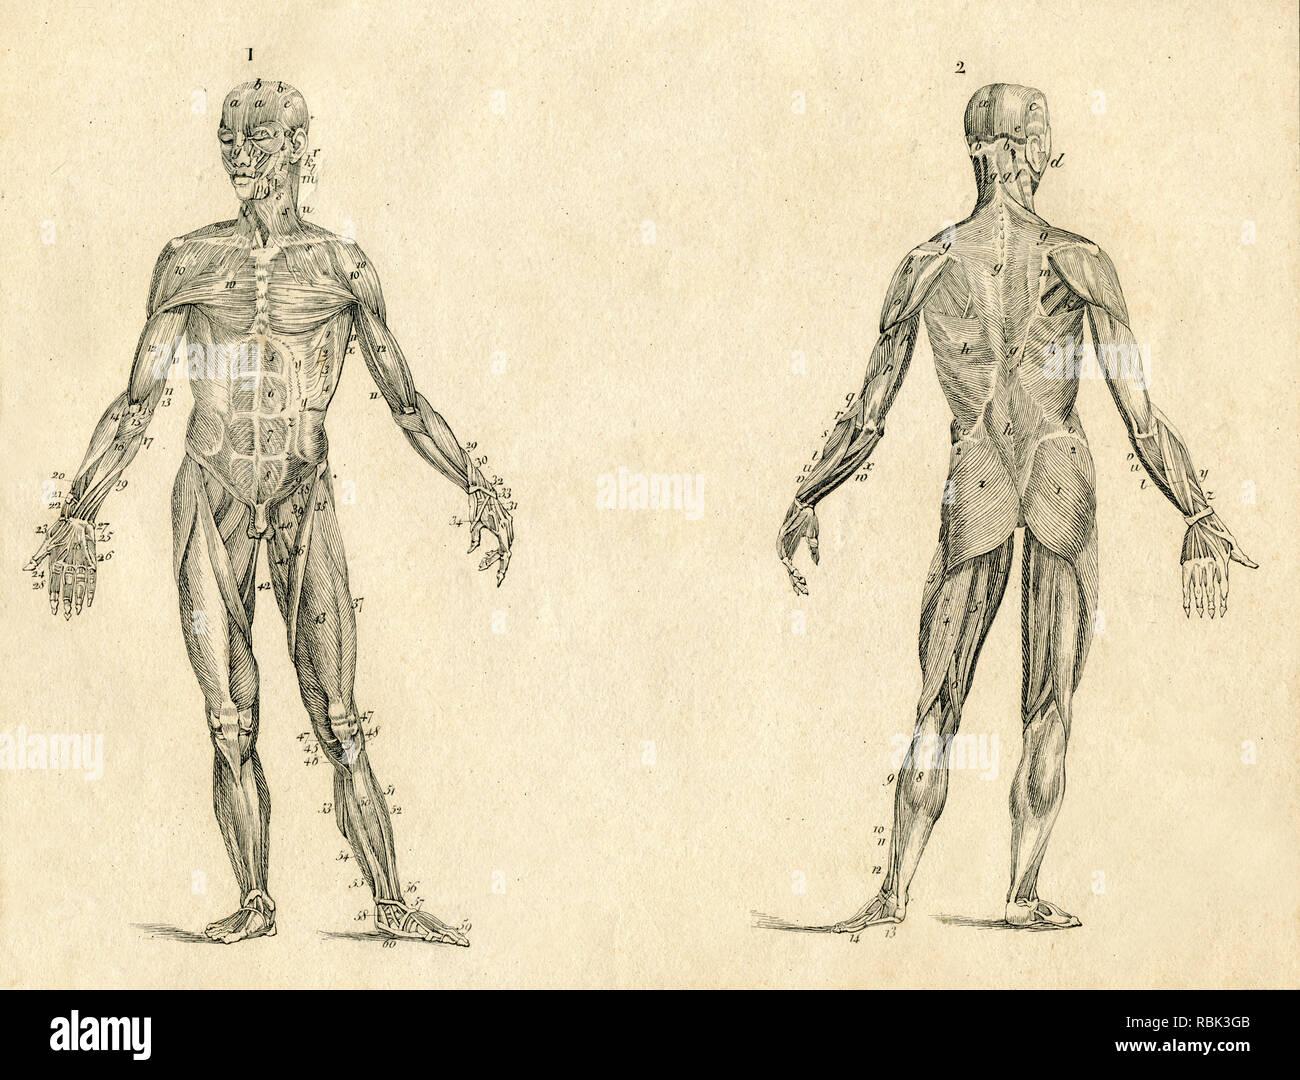 Anatomie du muscle humain dessin illustration gravée vintage Photo Stock